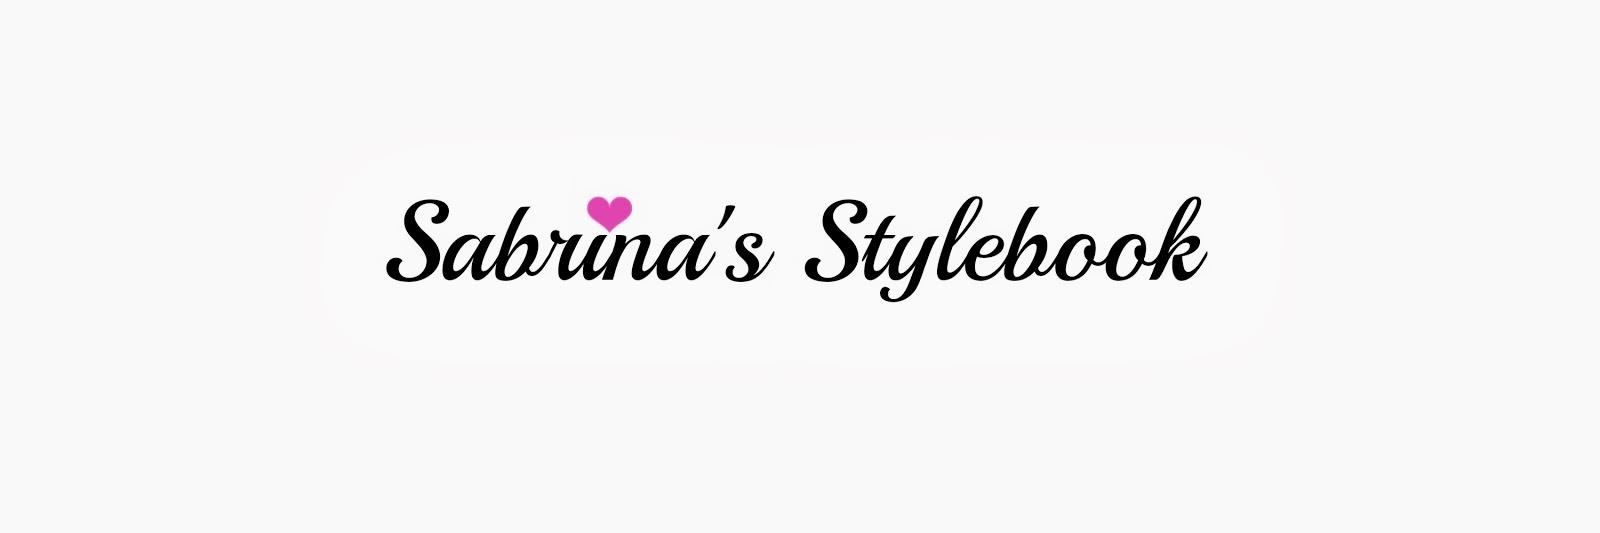 Sabrina's Stylebook